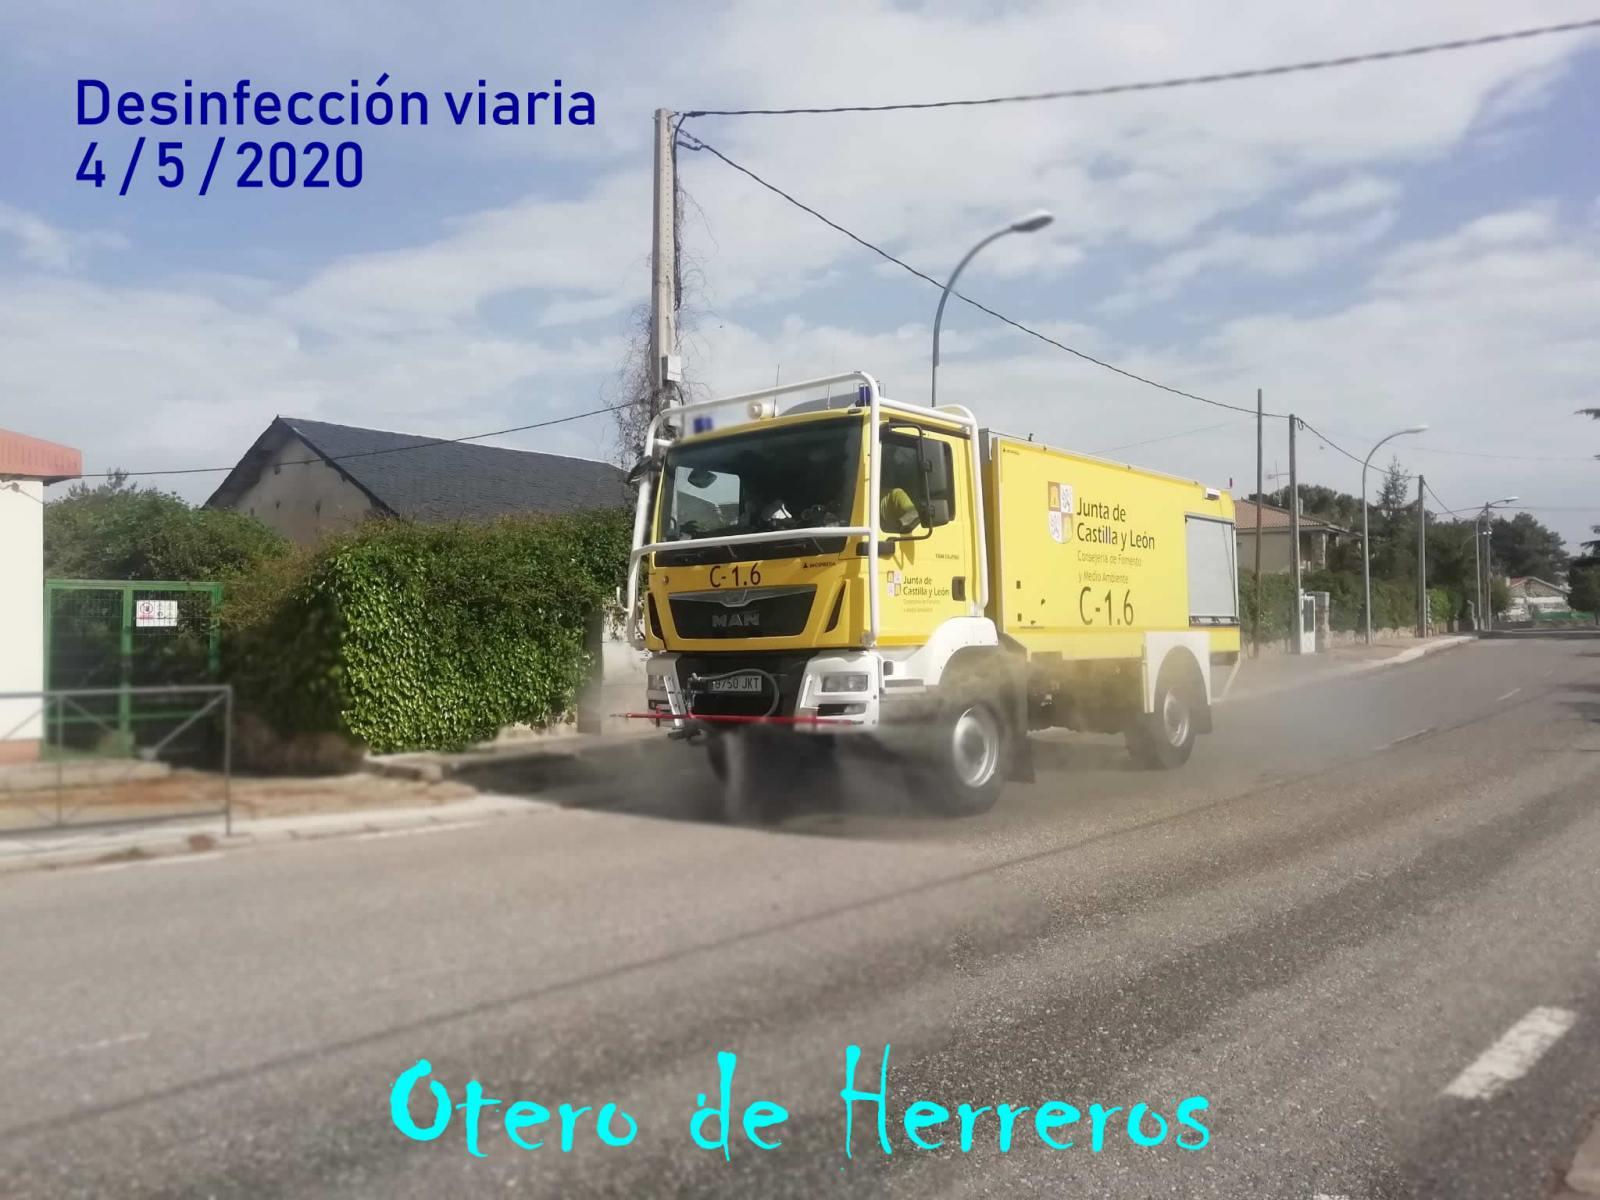 PHOTO-2020-05-04-11-13-05-copia-2